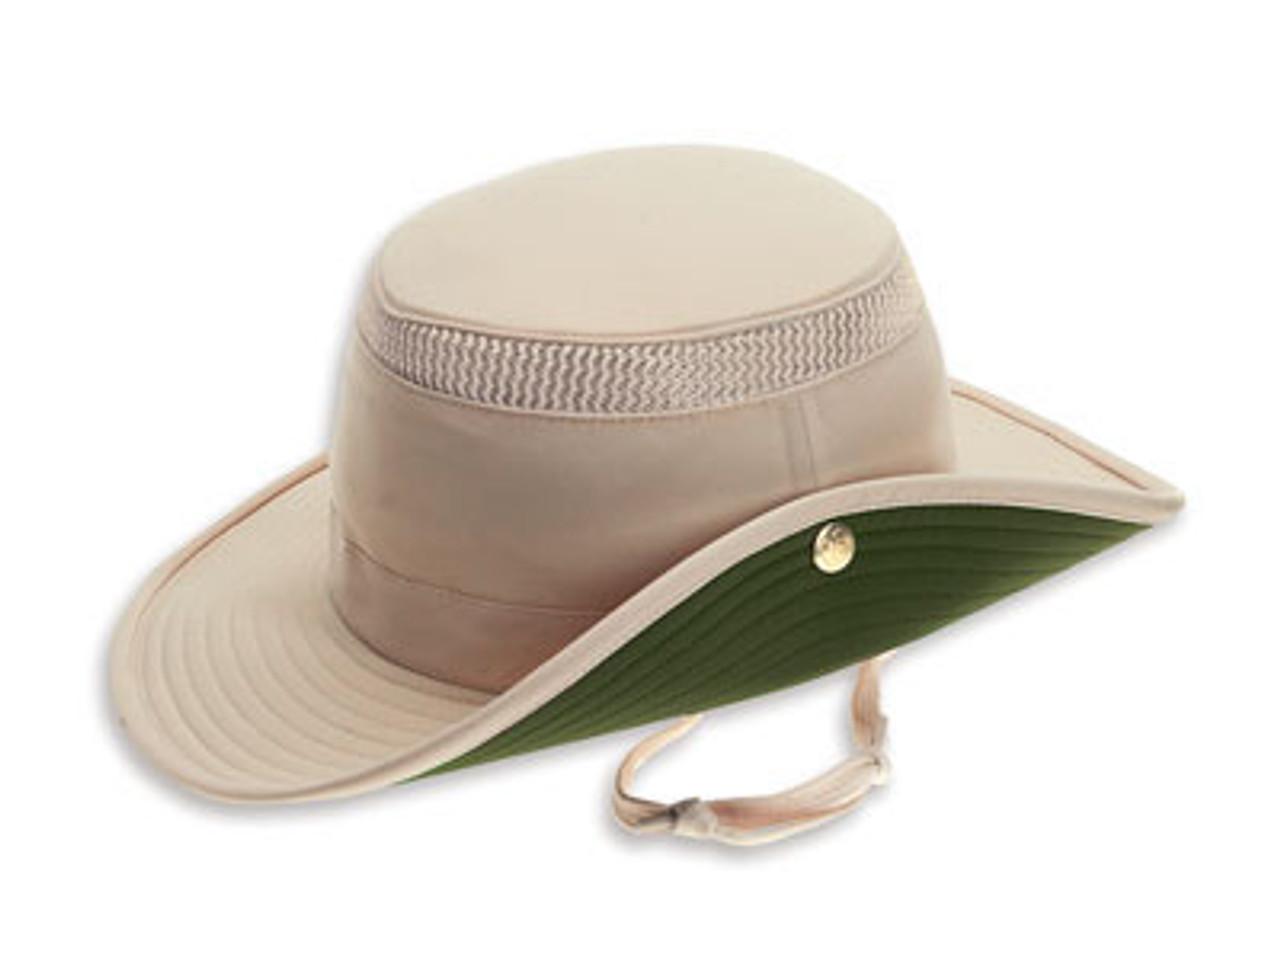 47c4e737a Tilley - LTM3 AIRFLO Nylantium Hat